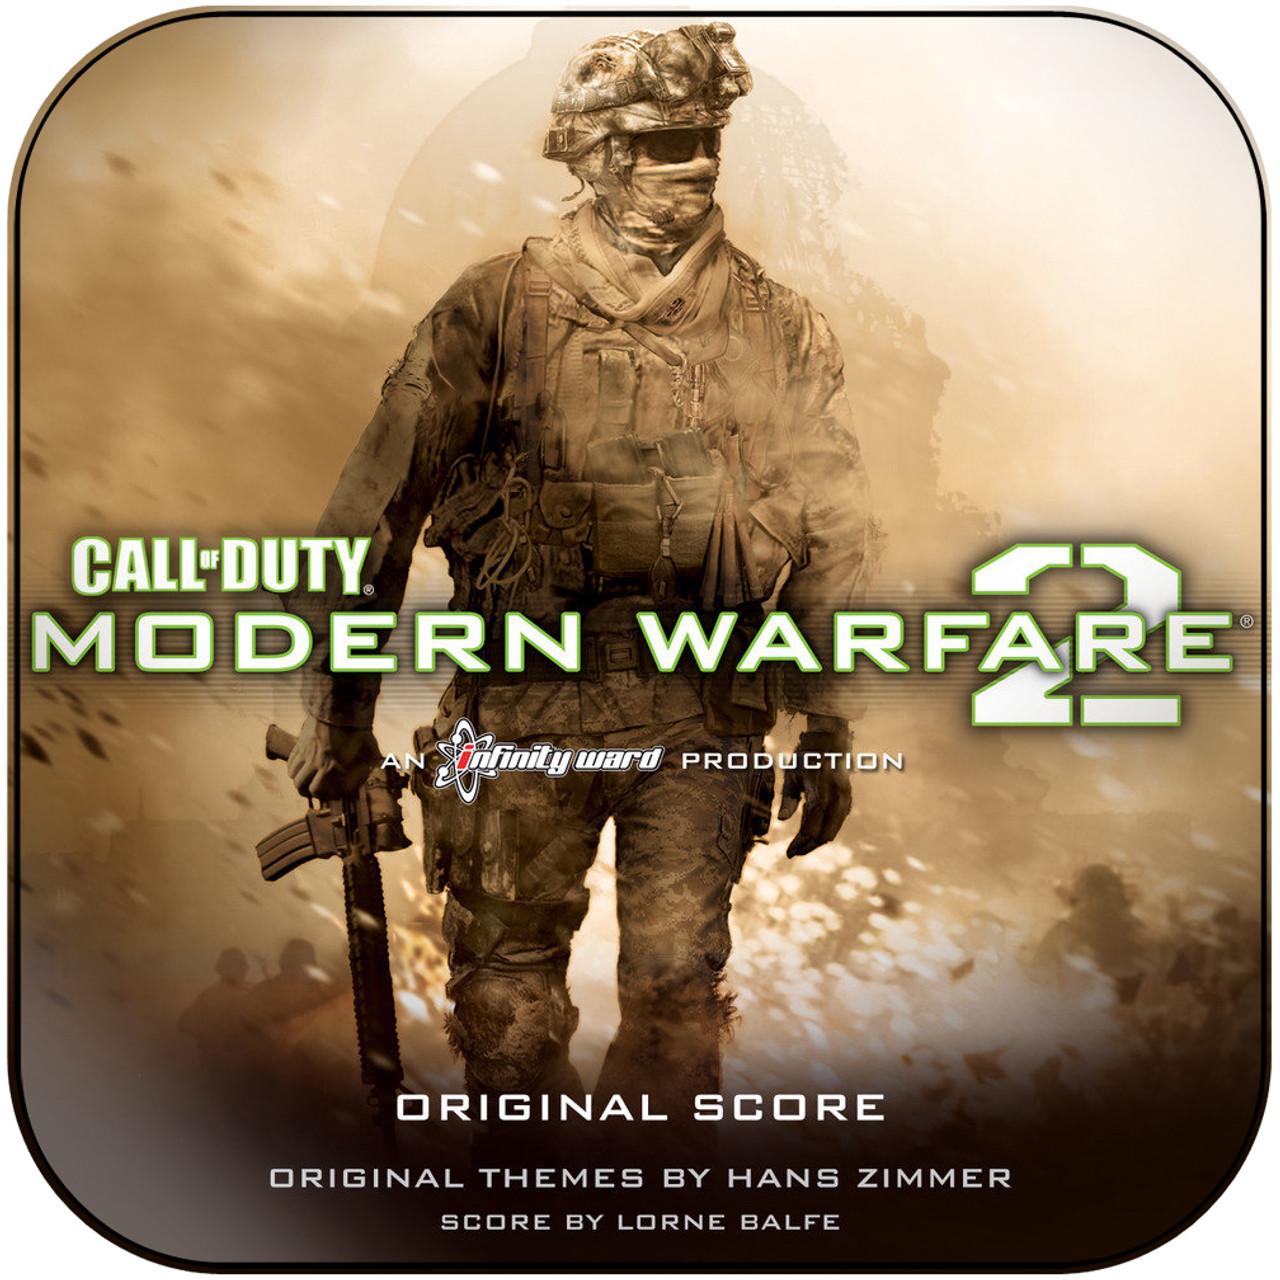 Hans Zimmer Call Of Duty Modern Warfare 2 Album Cover Sticker